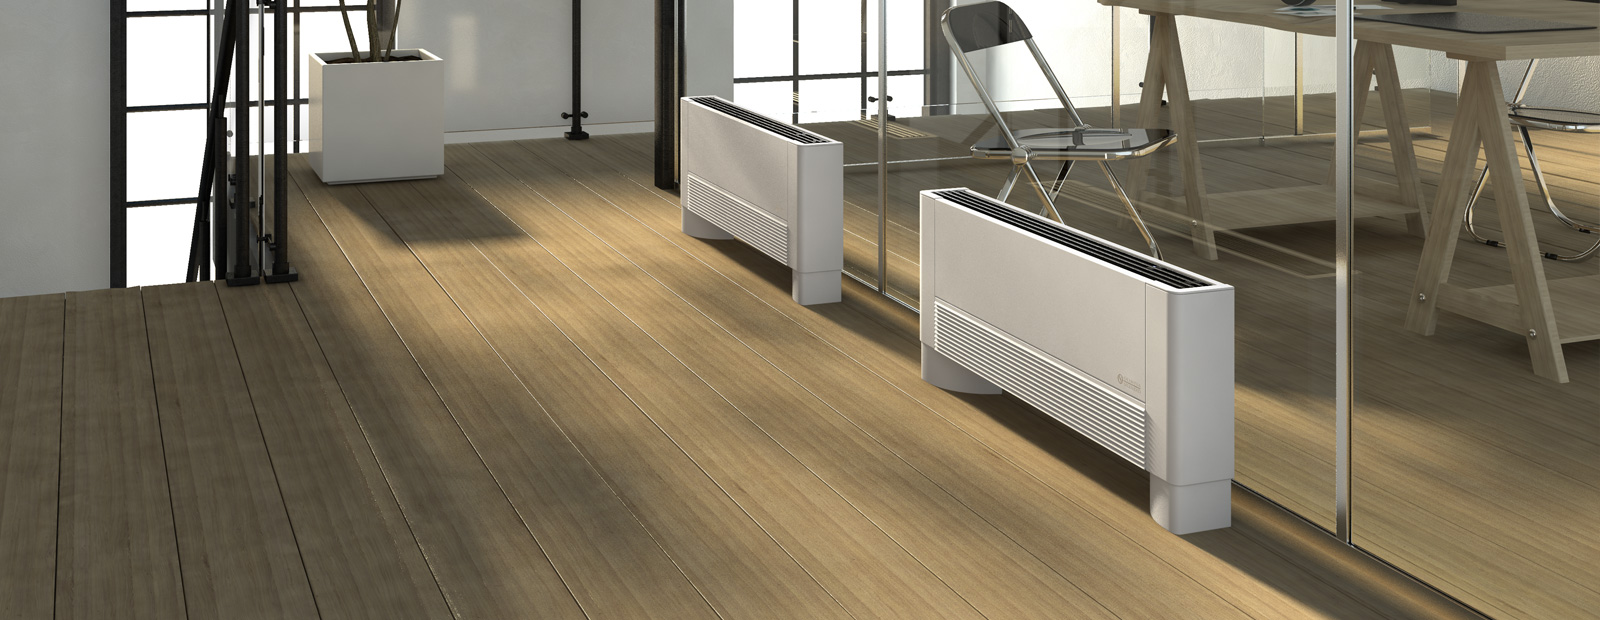 bi2 nano olimpia splendid. Black Bedroom Furniture Sets. Home Design Ideas